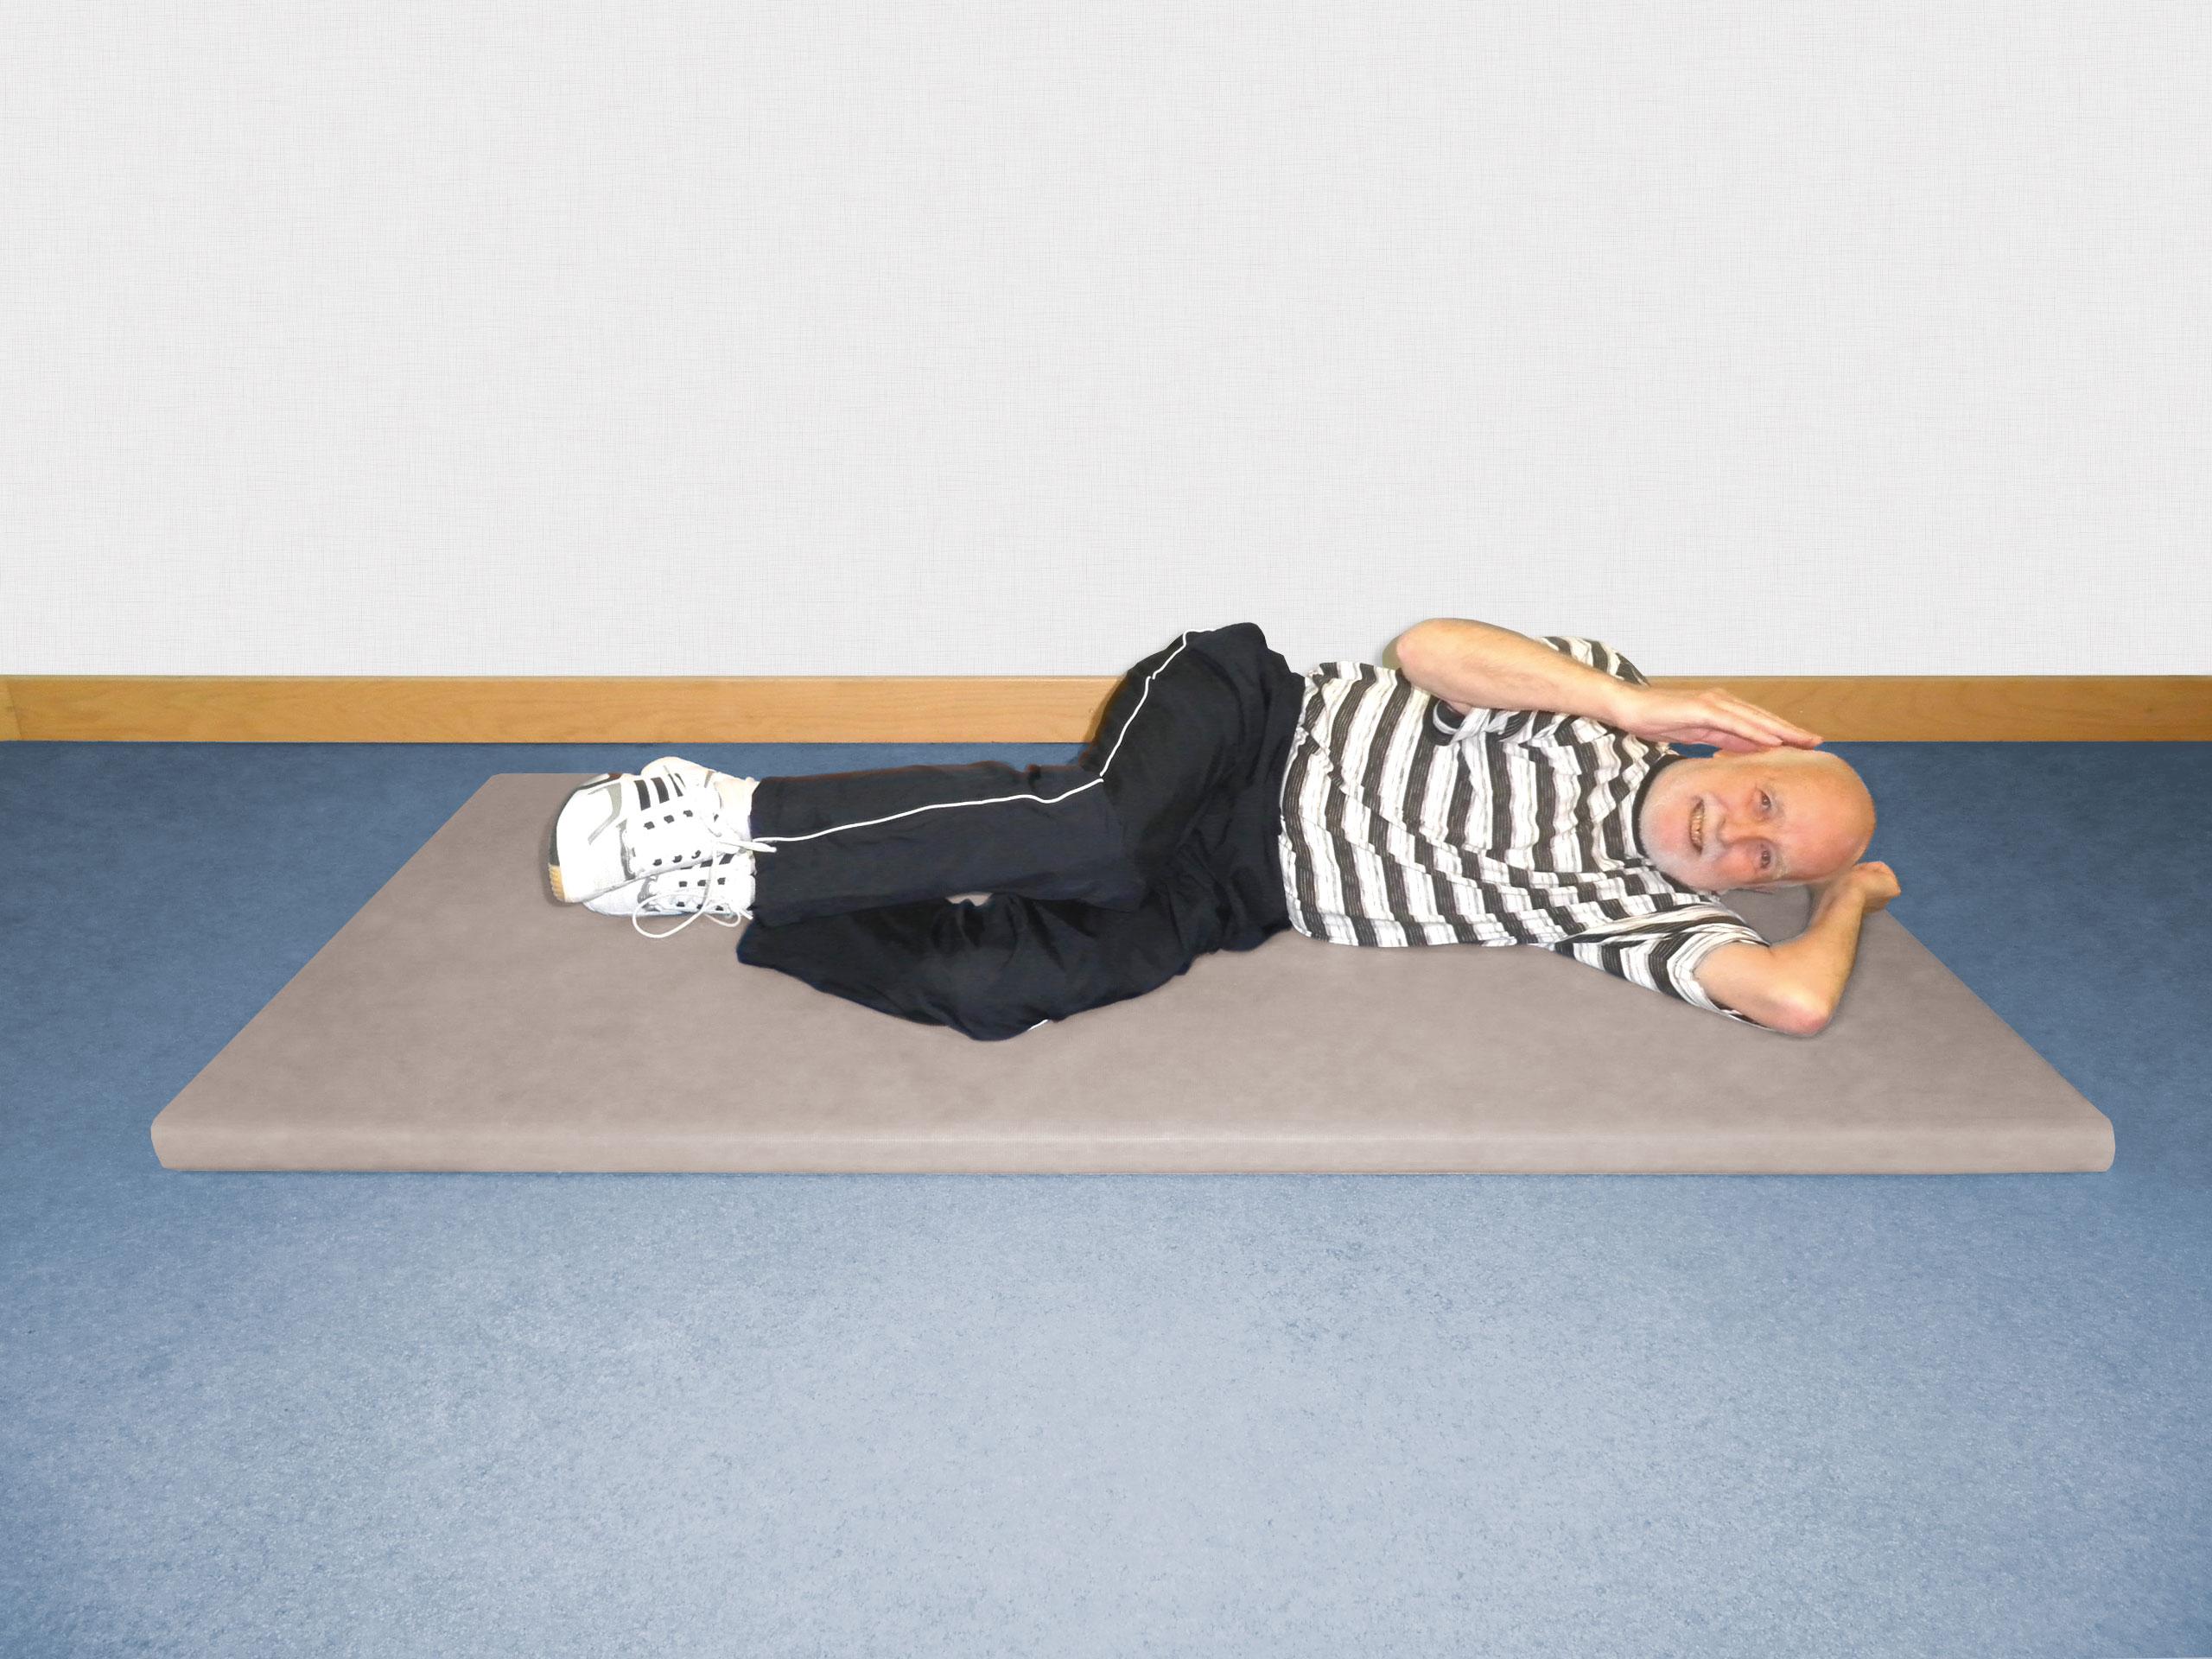 prostata trainieren